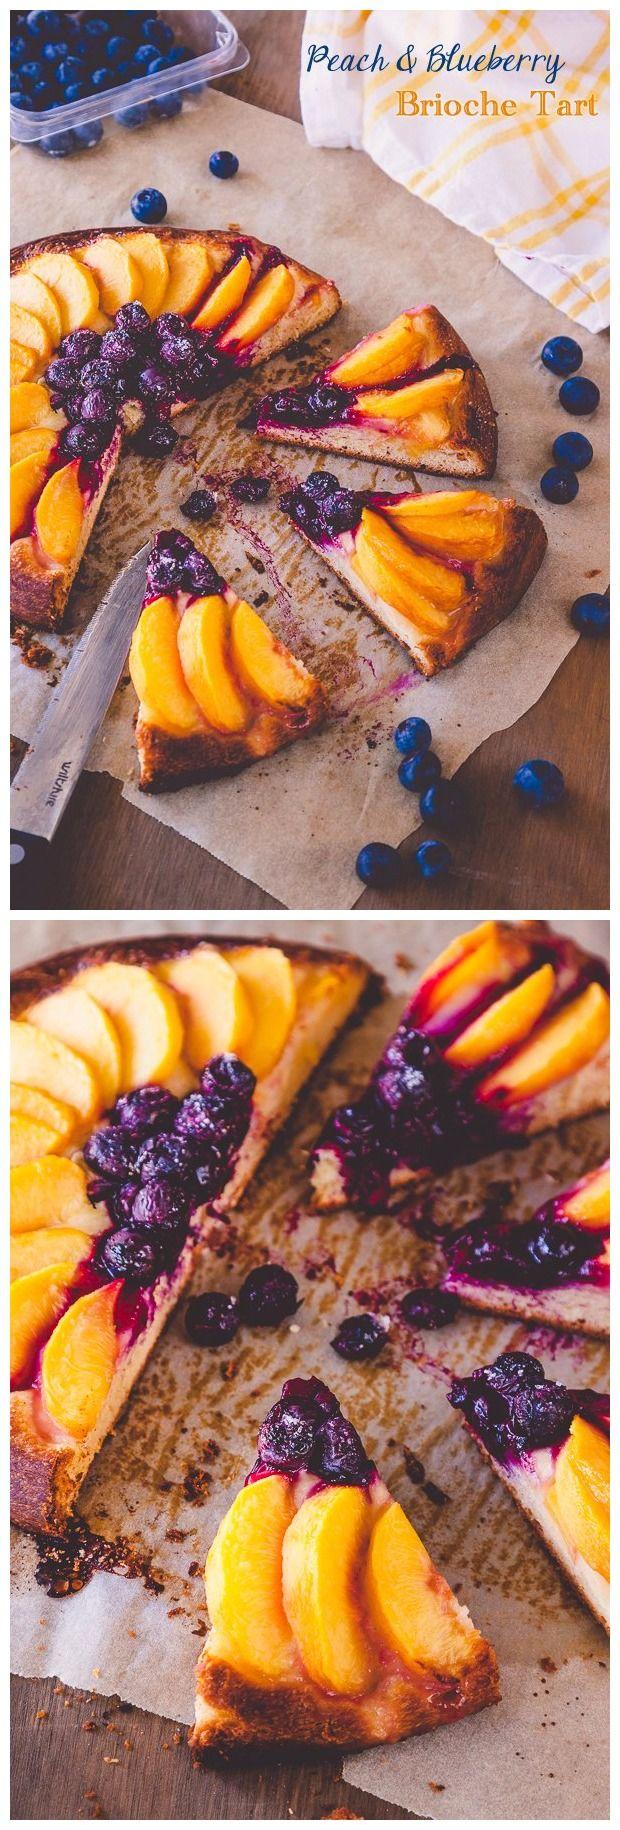 Peach and Blueberry Brioche Tart Recipe